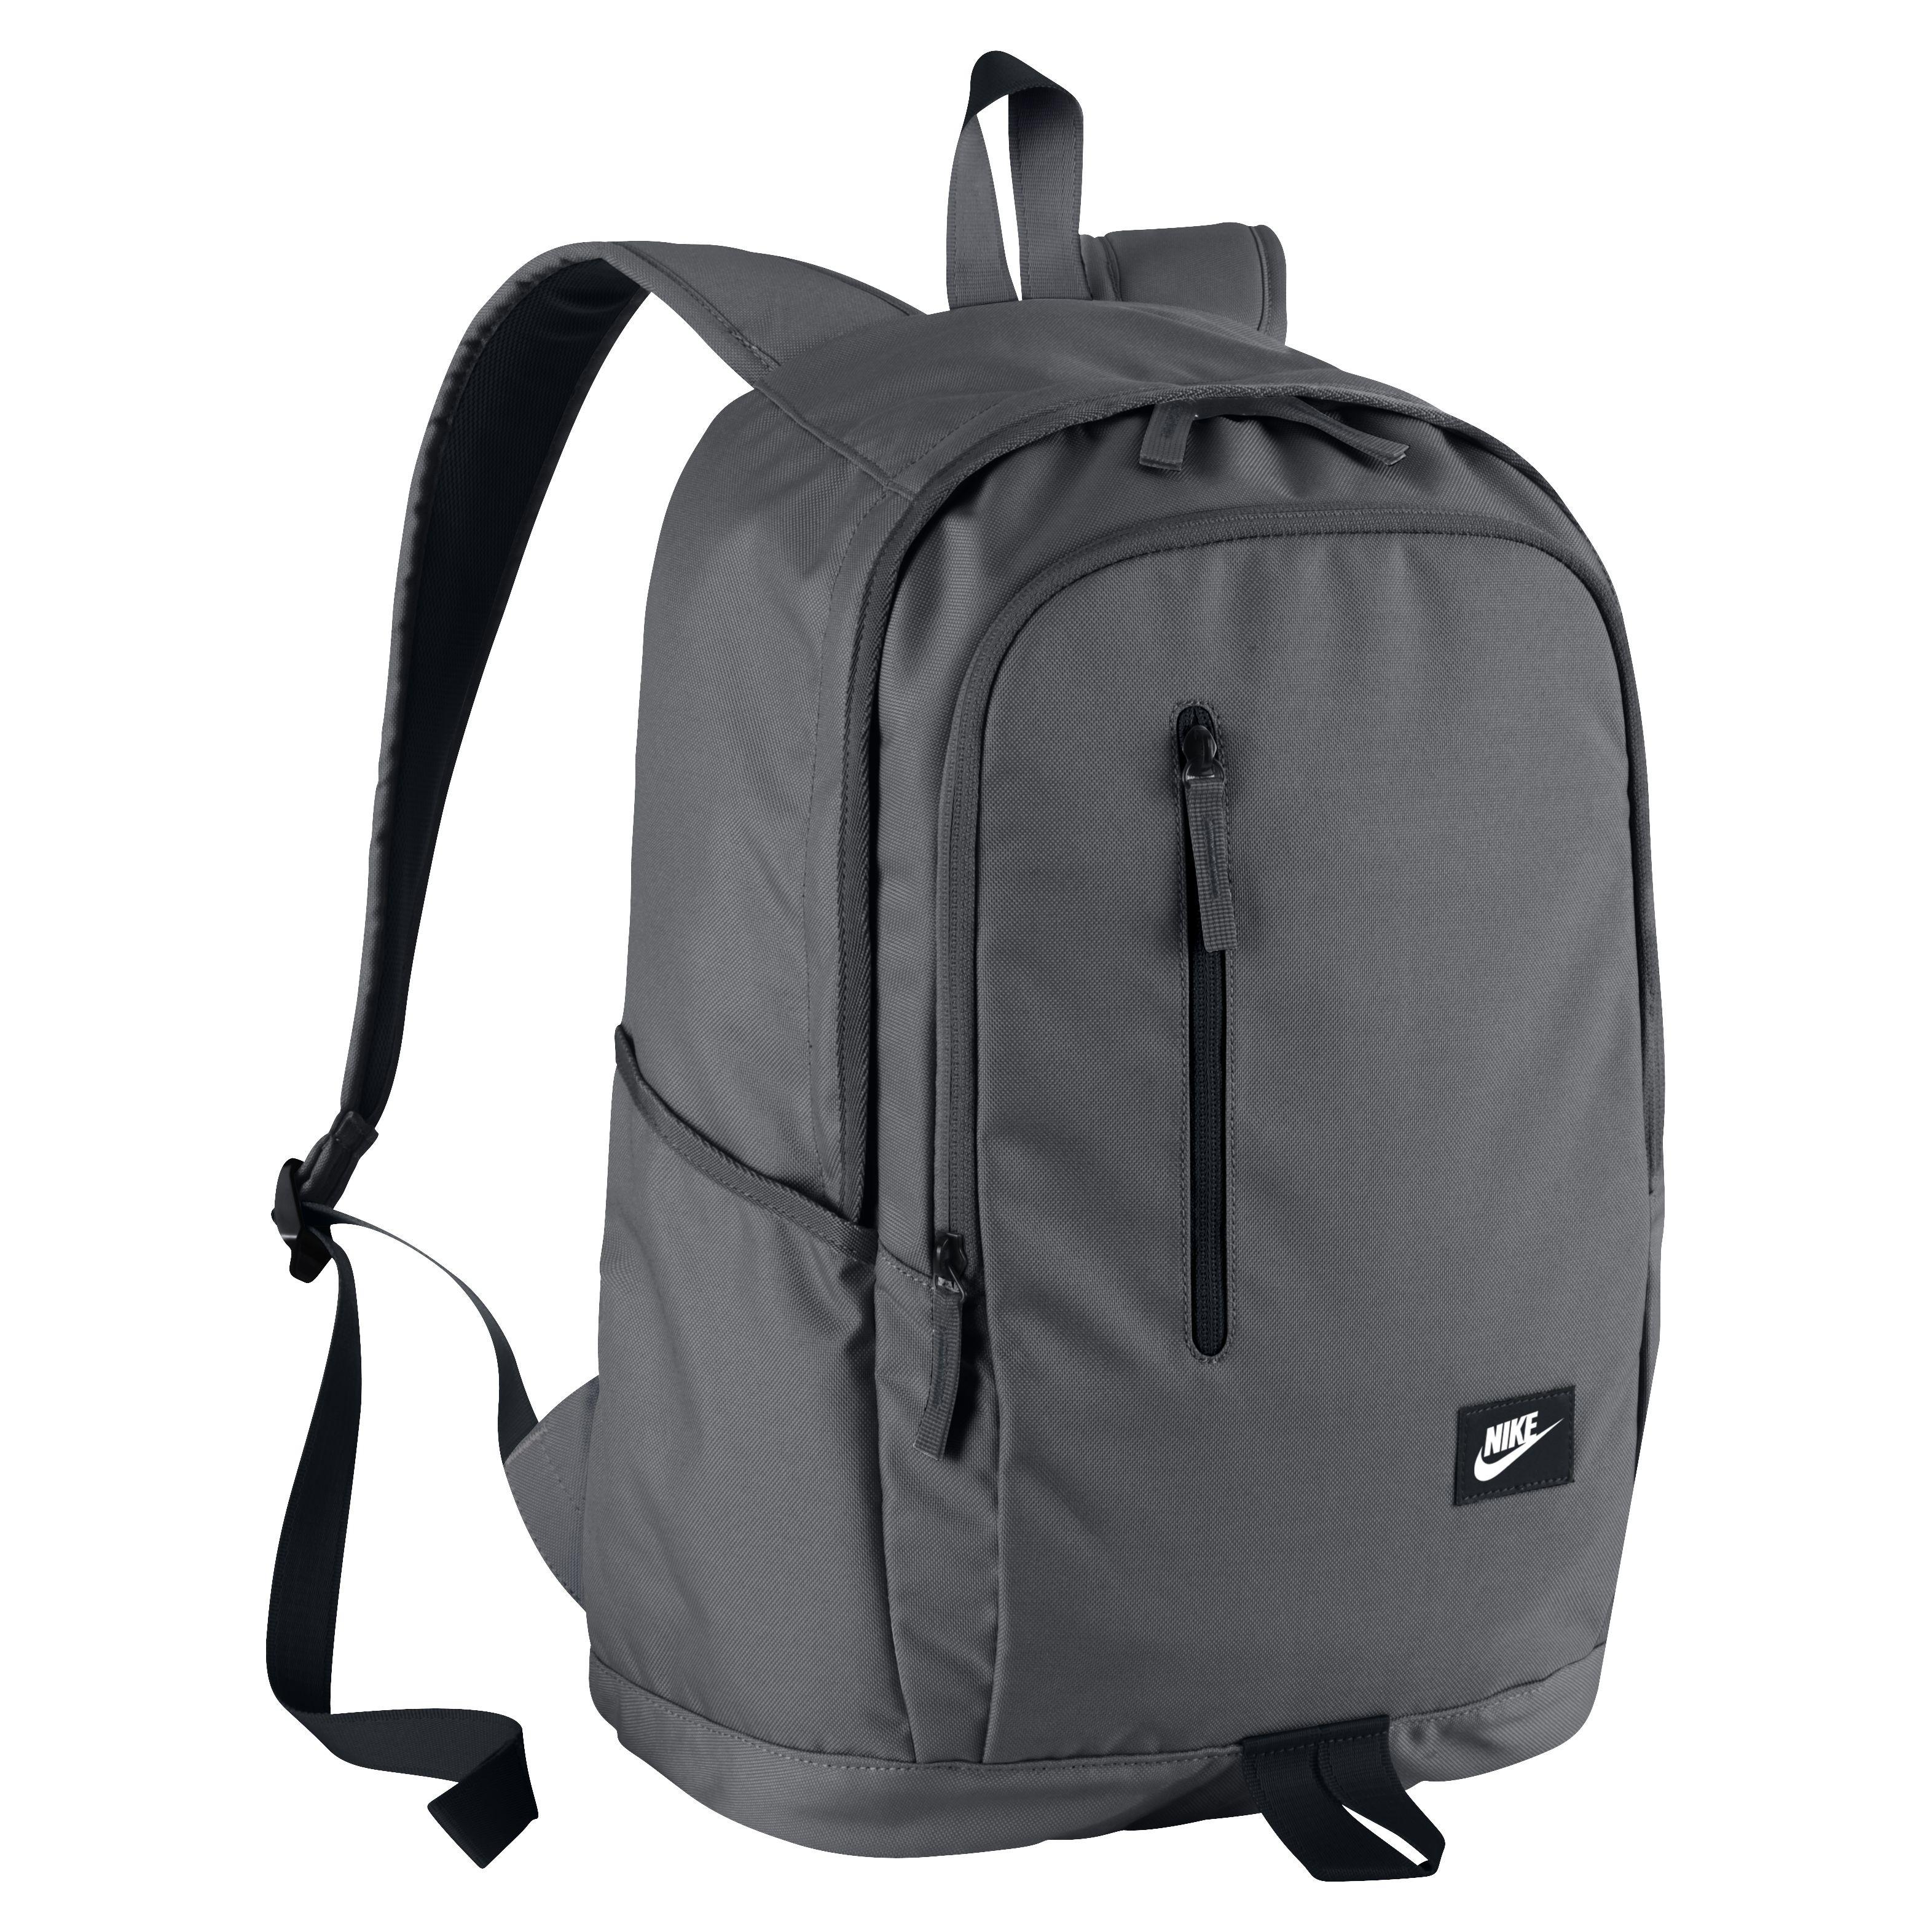 b4a2f9115d2 acc backpack Nike nike all access soleday - sol - Раници - Аксесоари ...